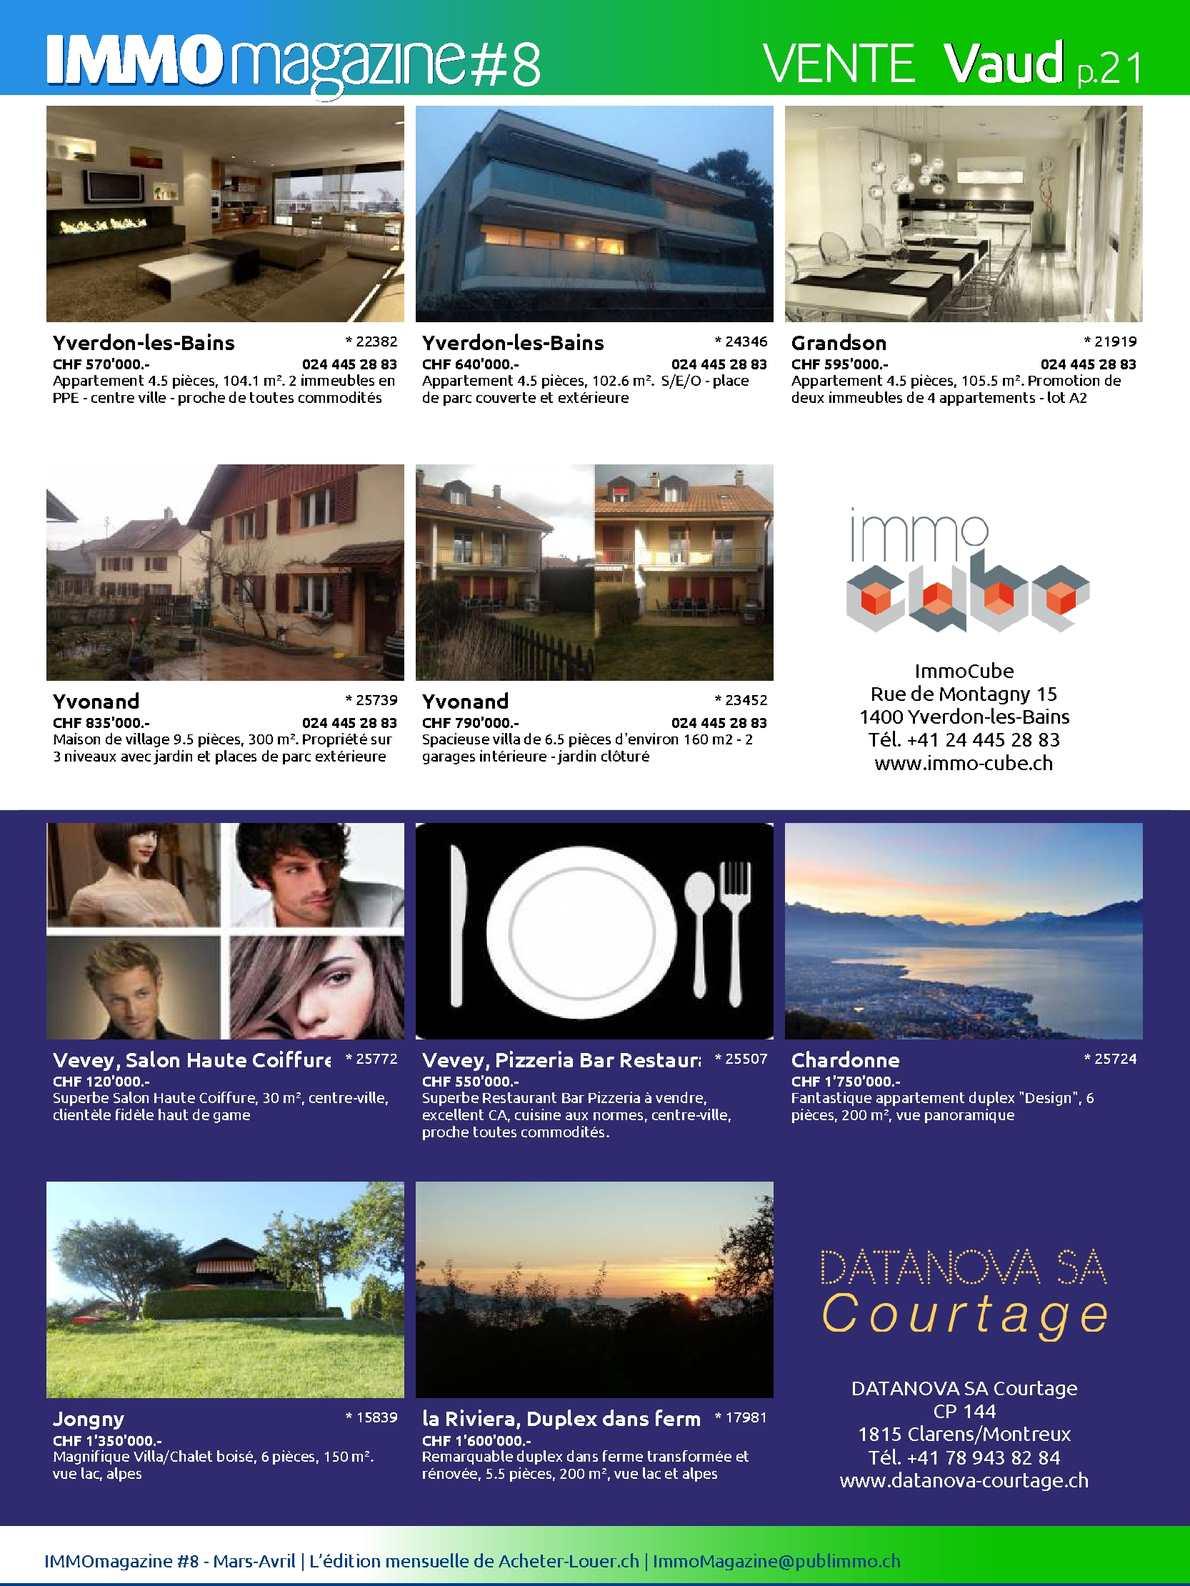 Immomagazine No.8 Par Acheter-Louer.ch - Calameo Downloader avec Restaurant Avec Jardin 78